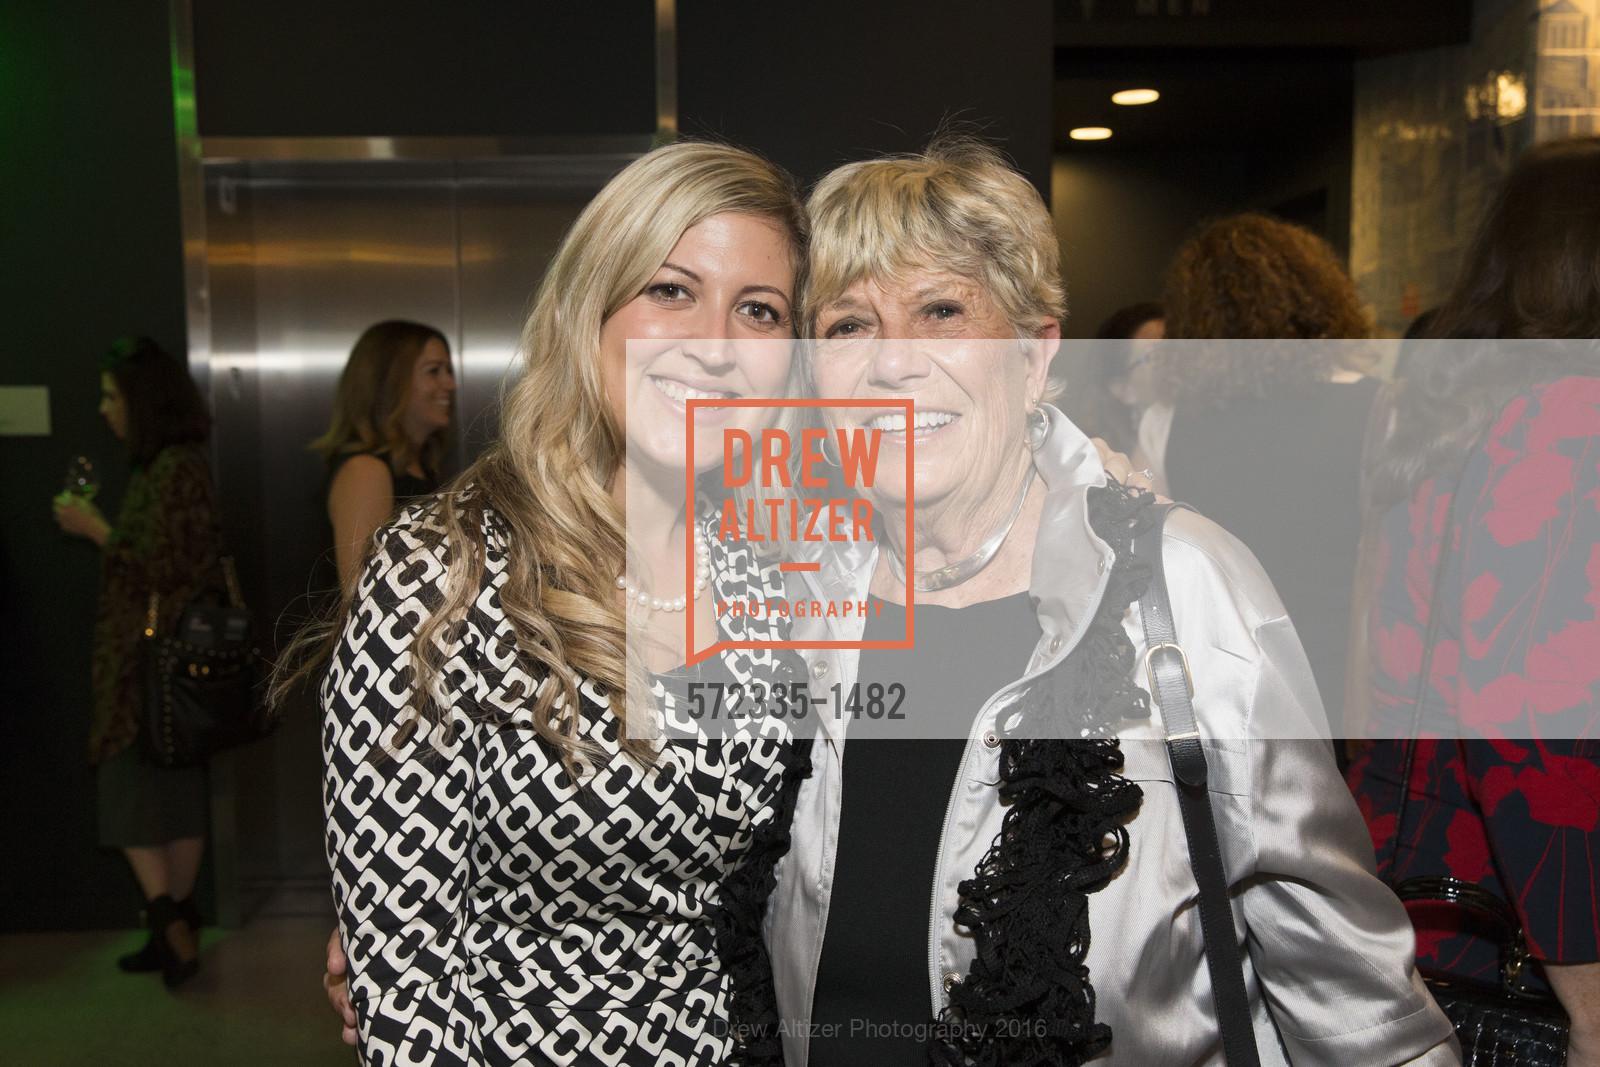 Sara Egide, Sandy Kelly, Photo #572335-1482